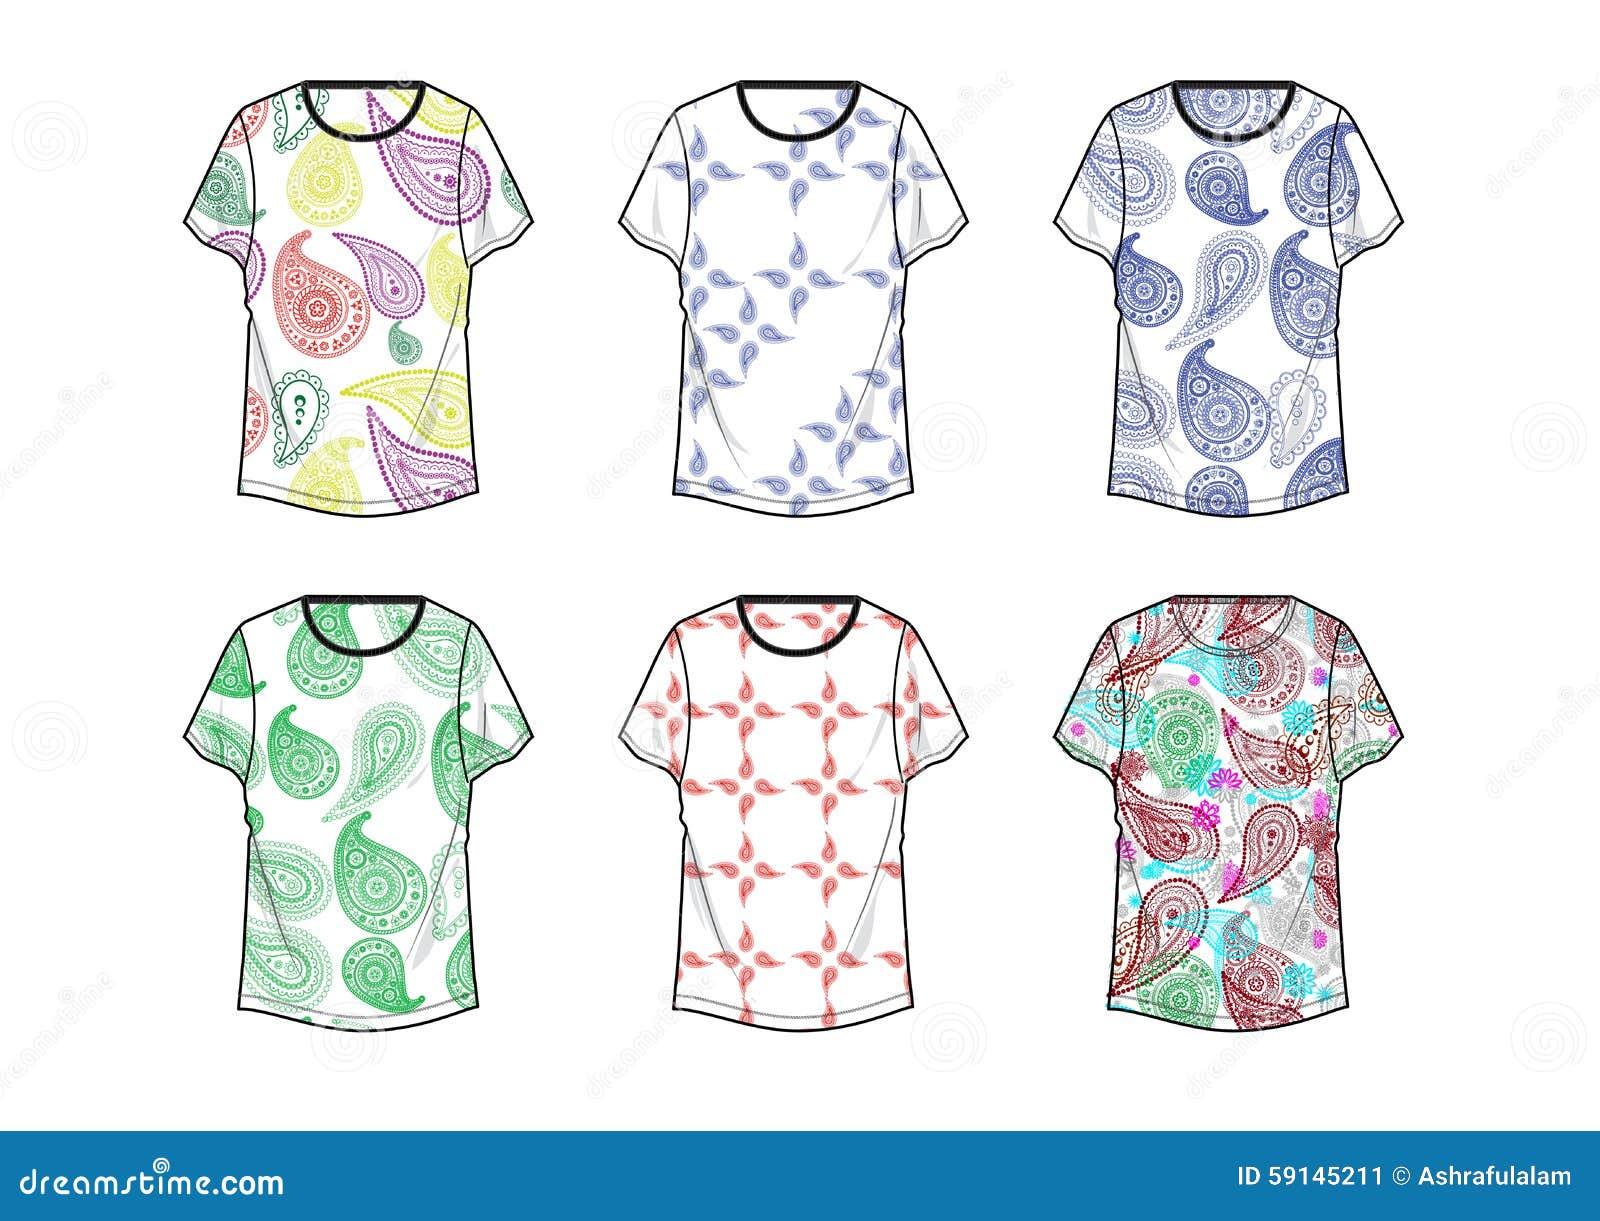 Dise o de kolka de la camiseta para la plantilla de la for Diseno de ropa